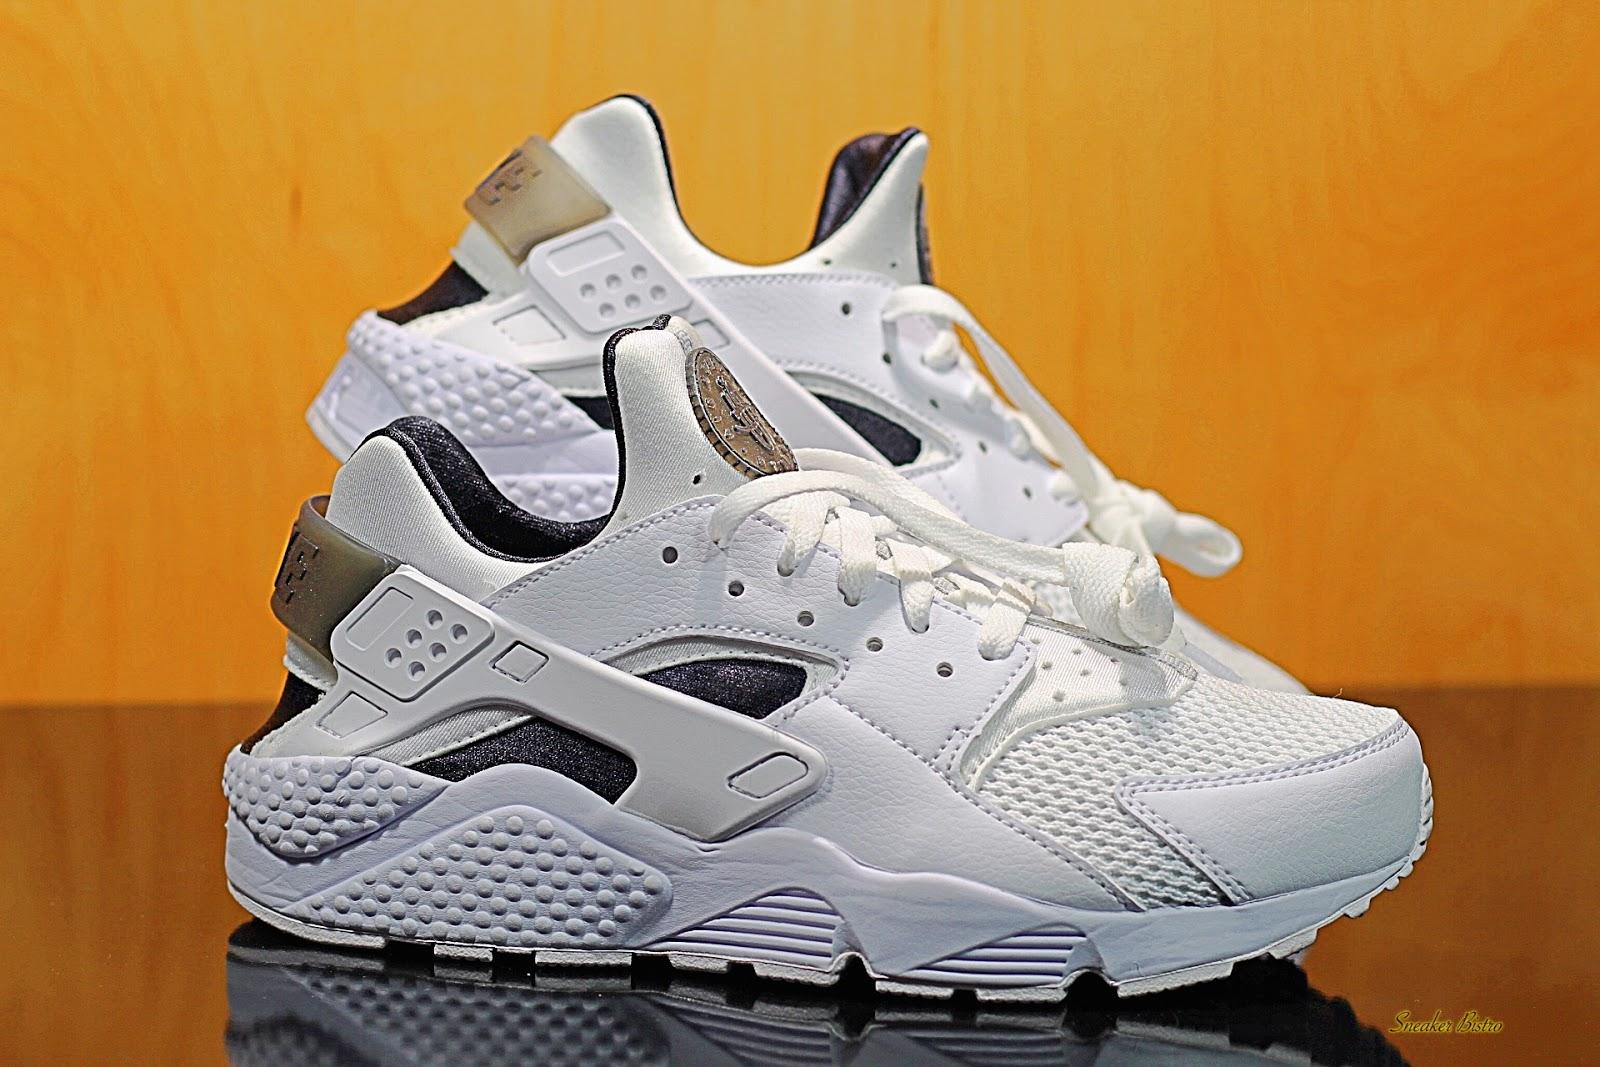 6c584e535957 Nike Air Huarache White Black-Pure Platinum. Release Information